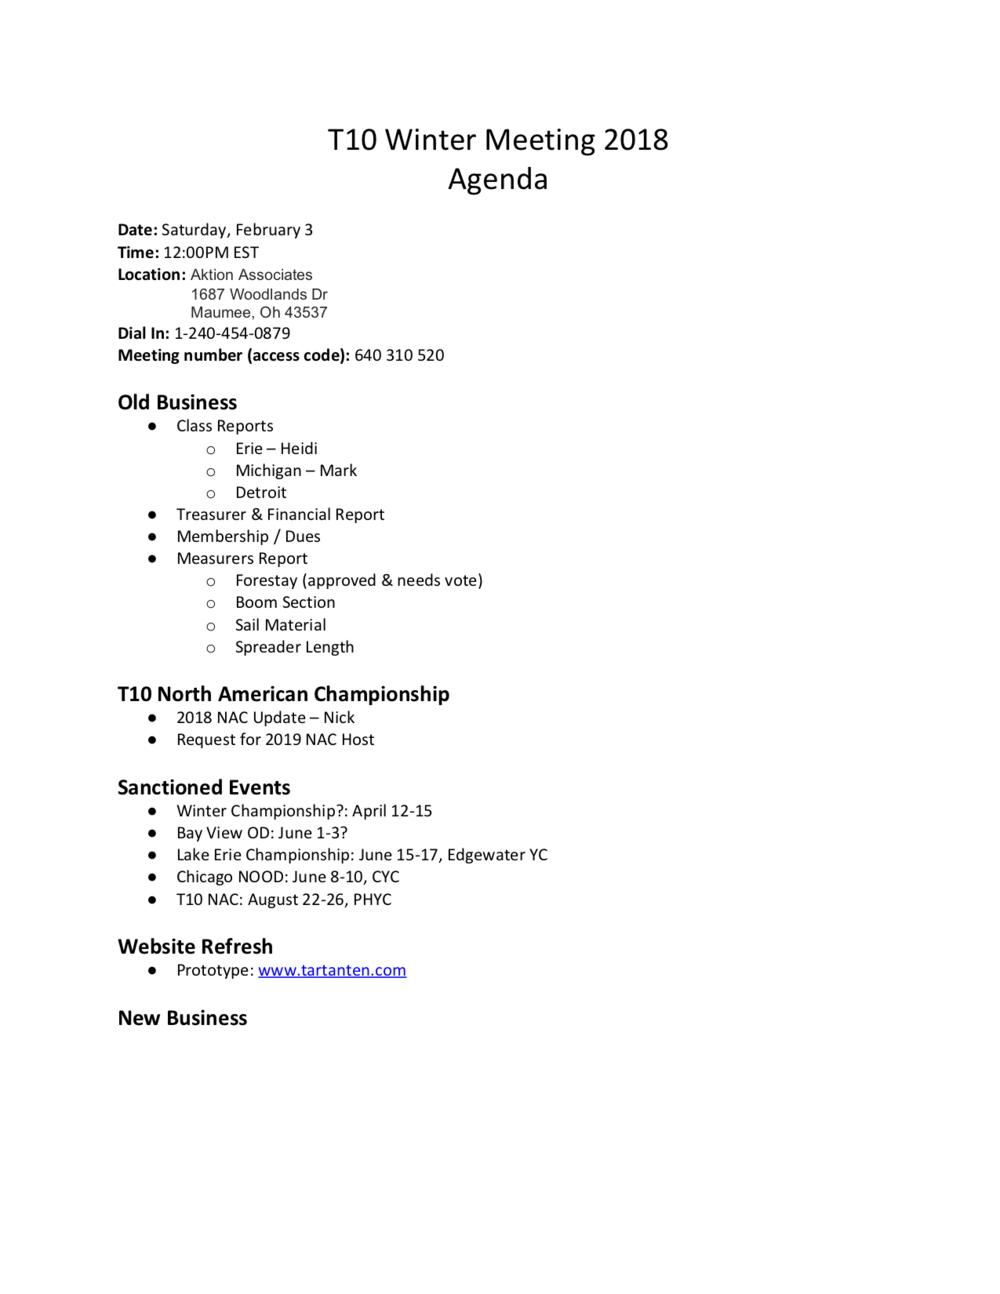 2018 T10 Winter Meeting Agenda.png